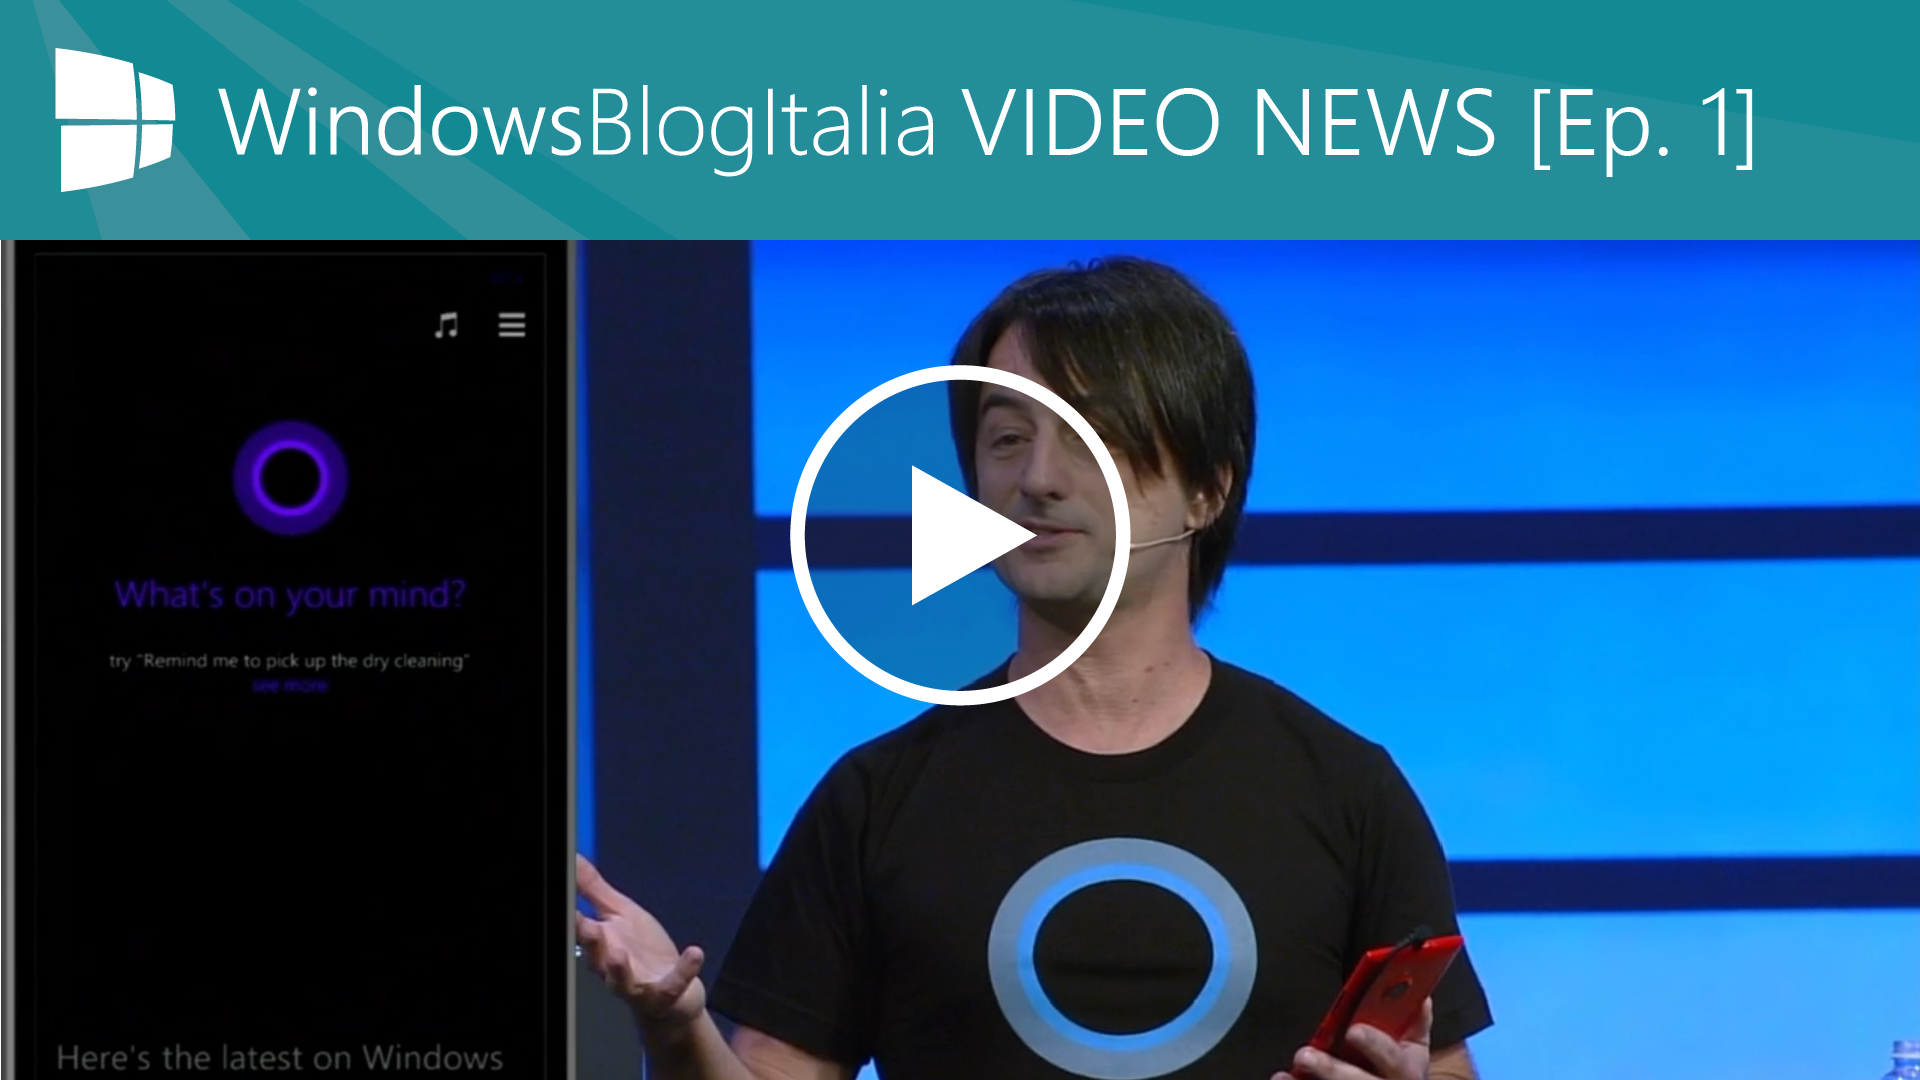 Video News 1b-01